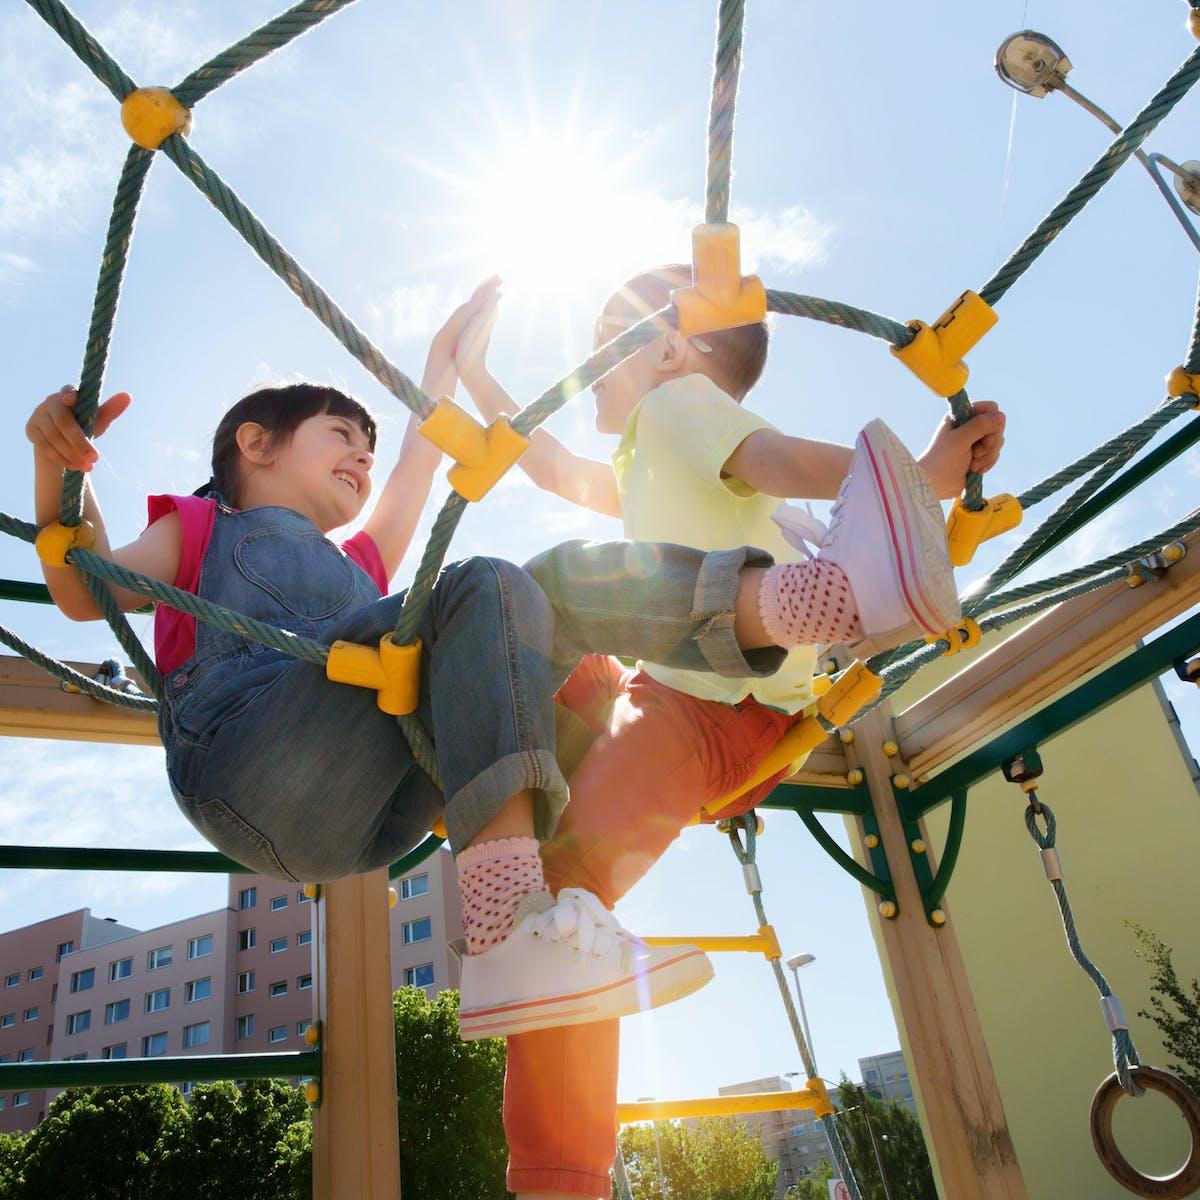 Do 'screaming children' in playgrounds ruin neighbourhood parks?